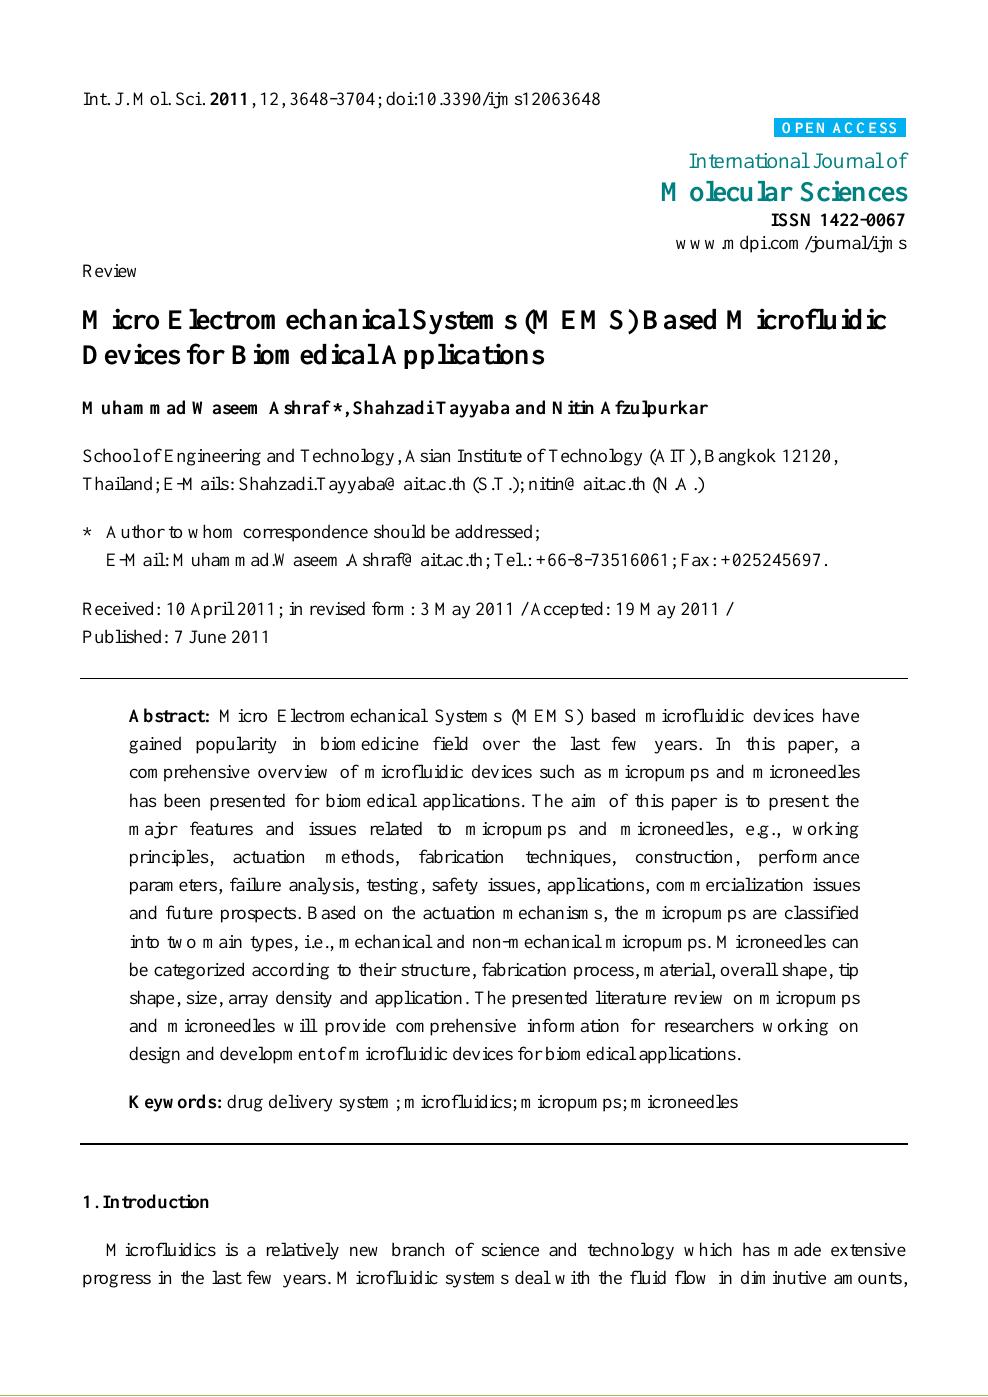 Micro Electromechanical Systems (MEMS) Based Microfluidic